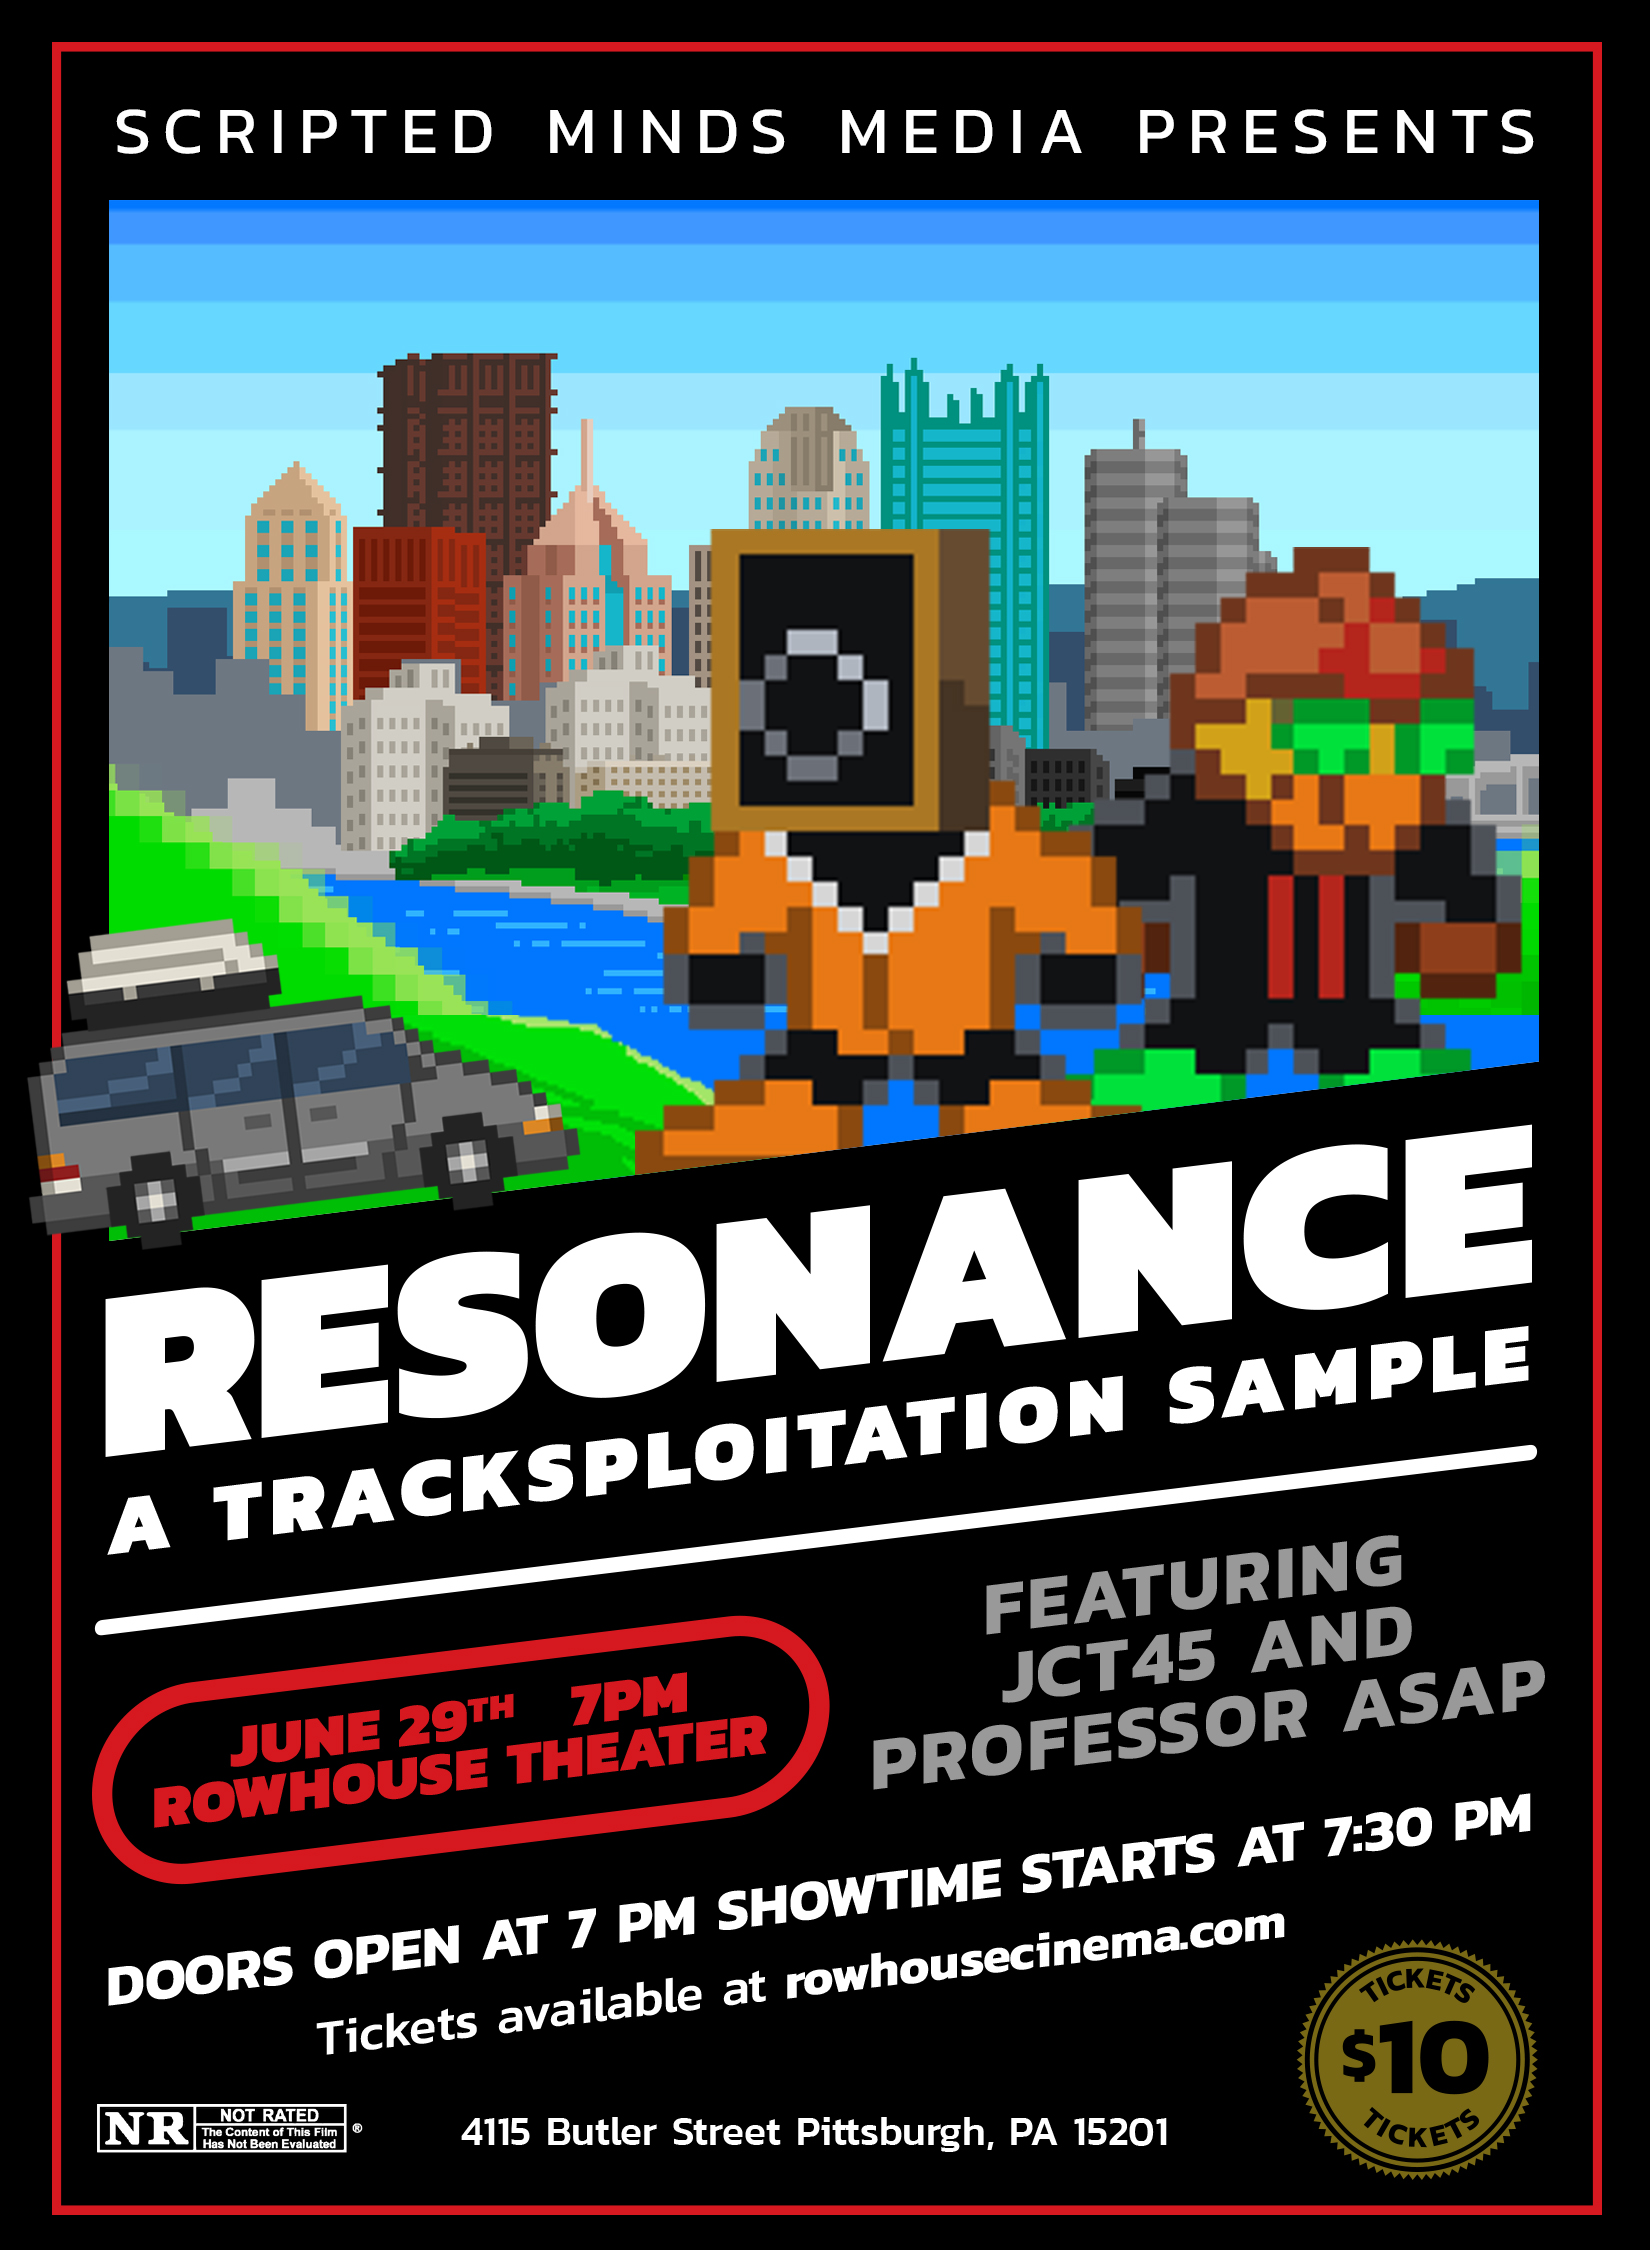 Poster for Resonance: A Tracksploitation Sample